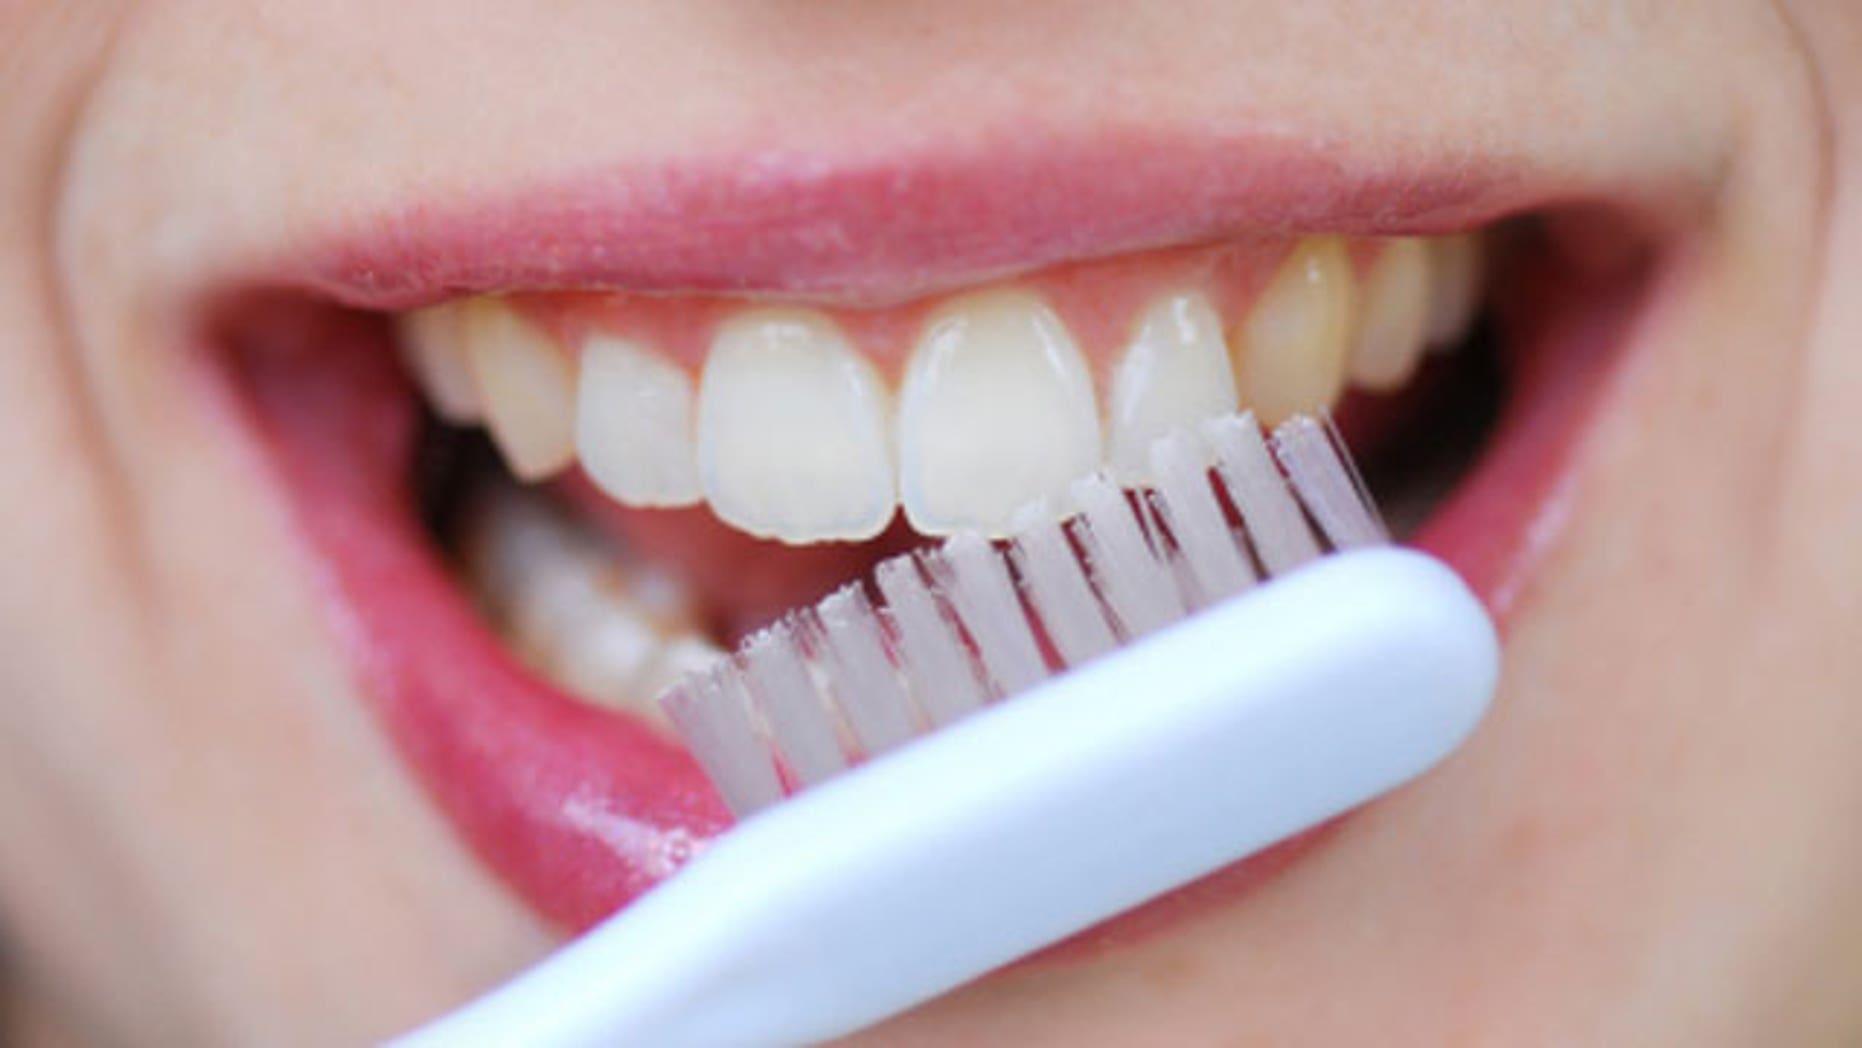 Dental problems 99